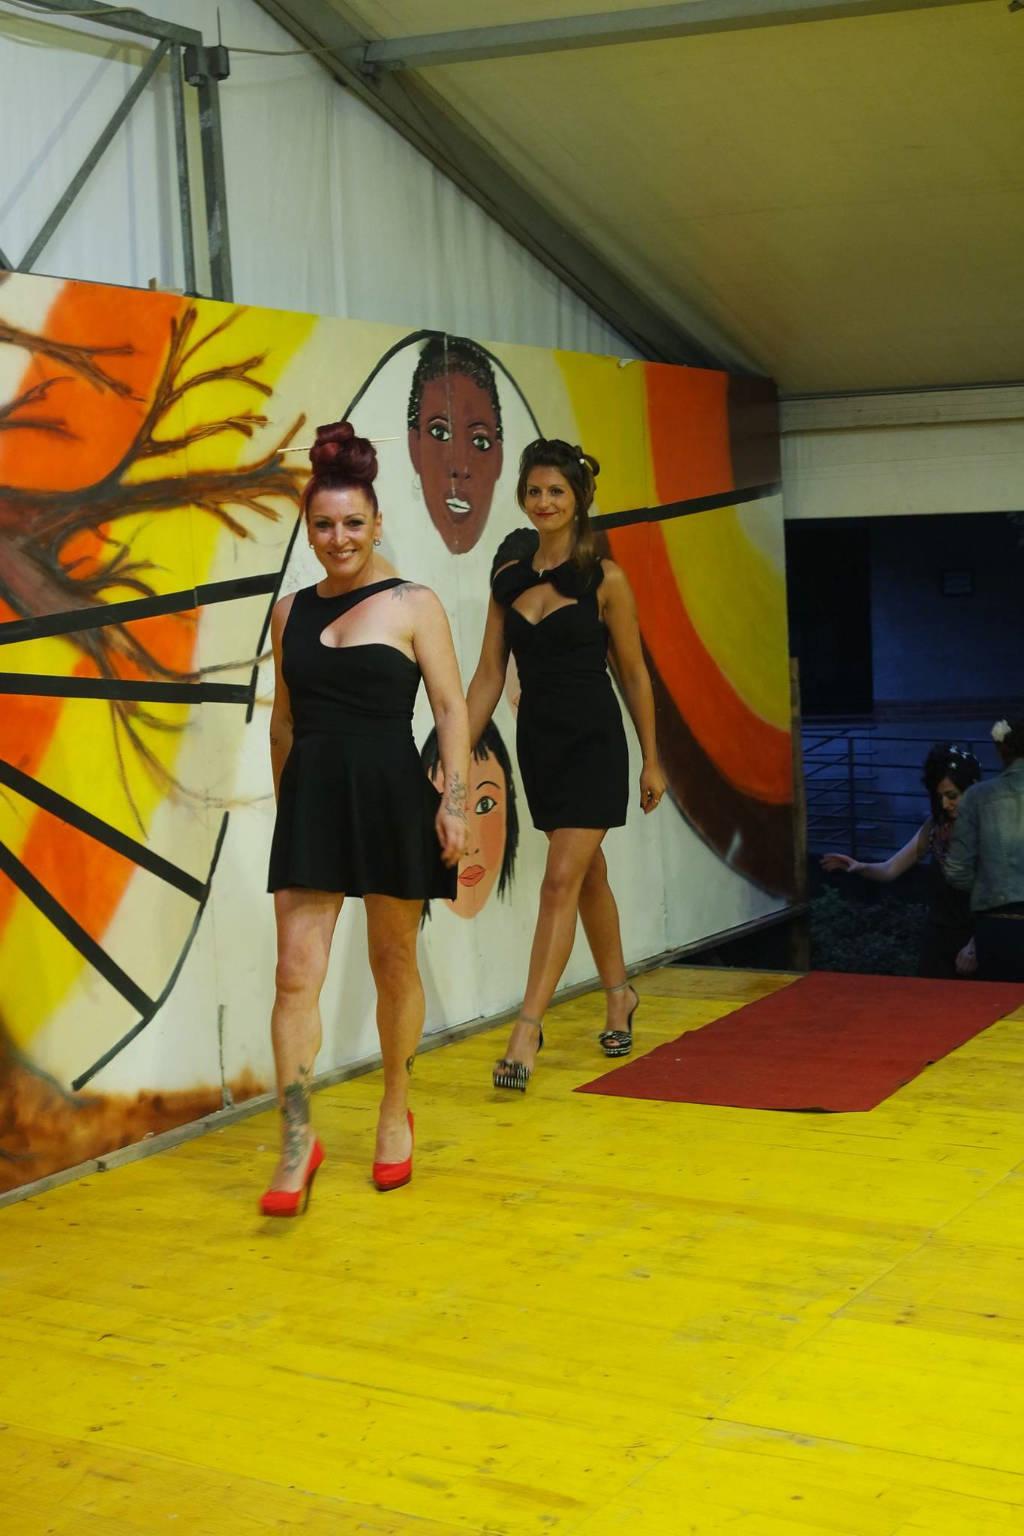 Accunciature in gara sfilano a Biumo